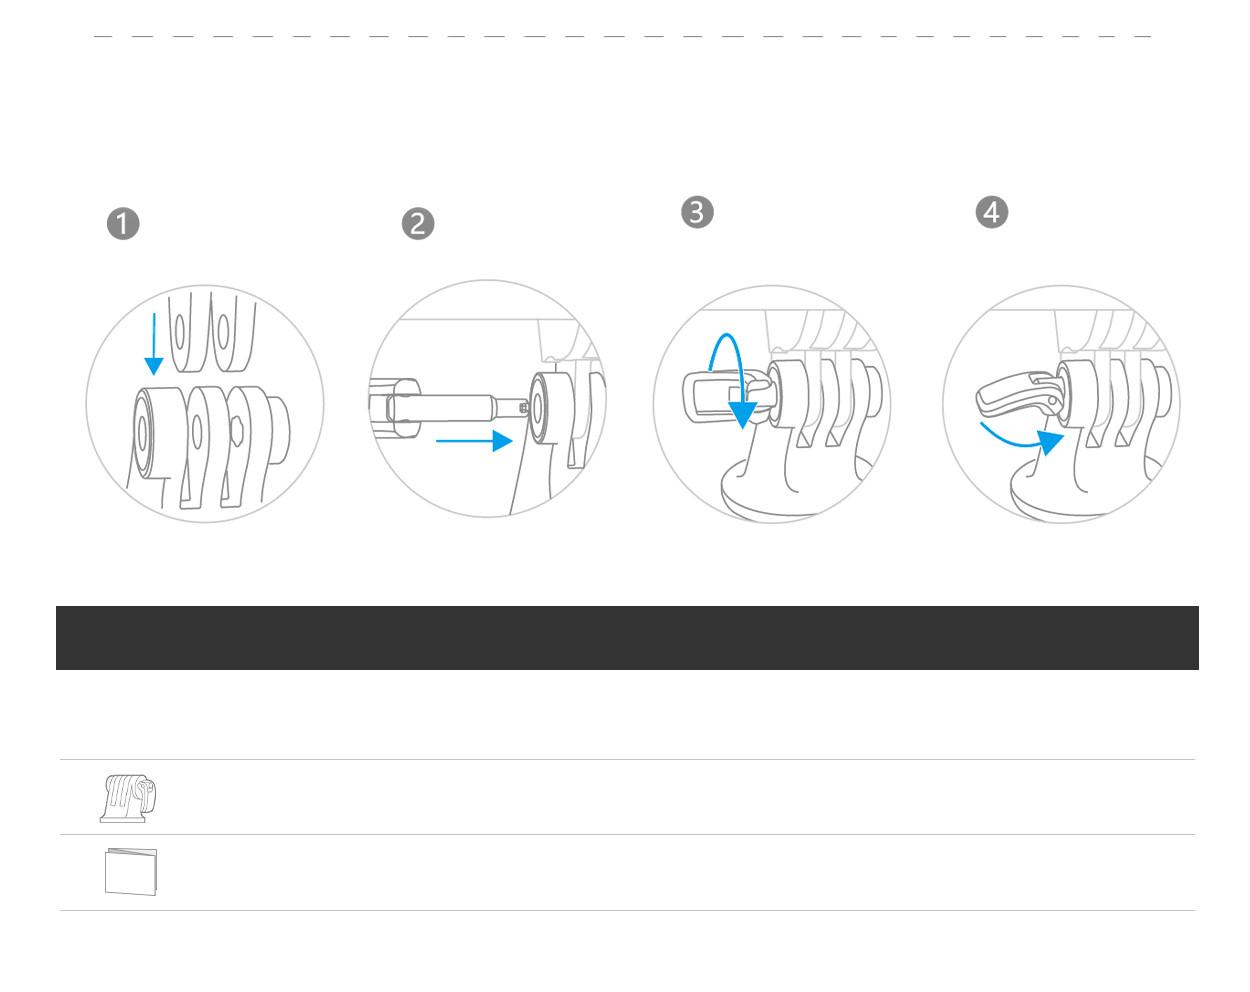 OSMO-POCKET-运动相机四分之一接口转接座-英文版_07.jpg